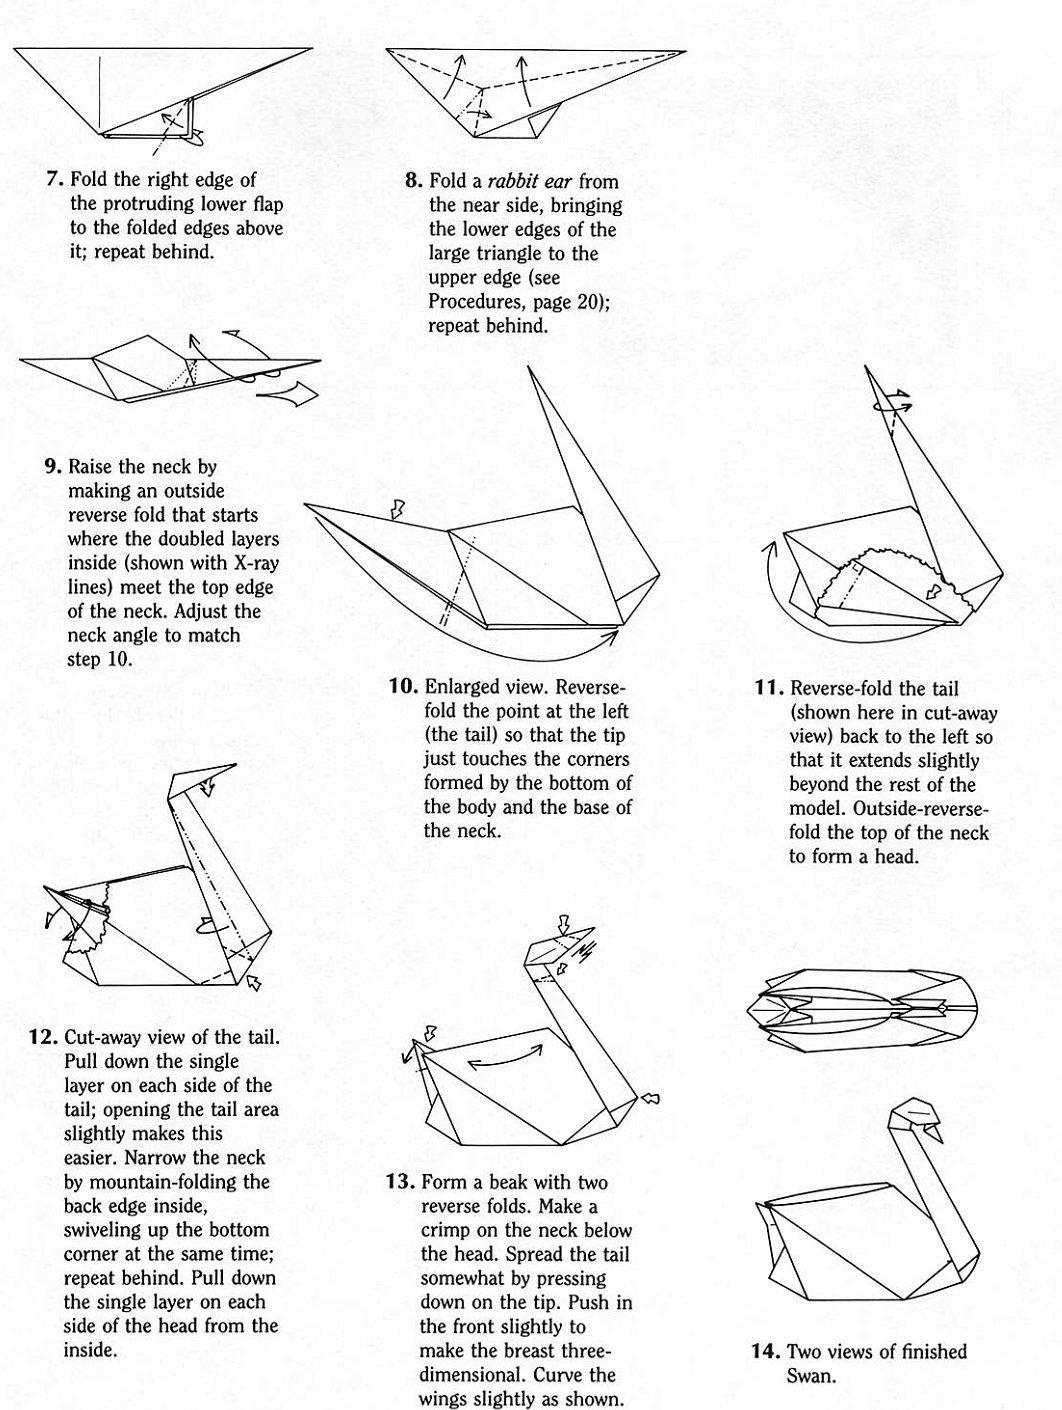 How to origami a swan - How To Origami A Swan 9